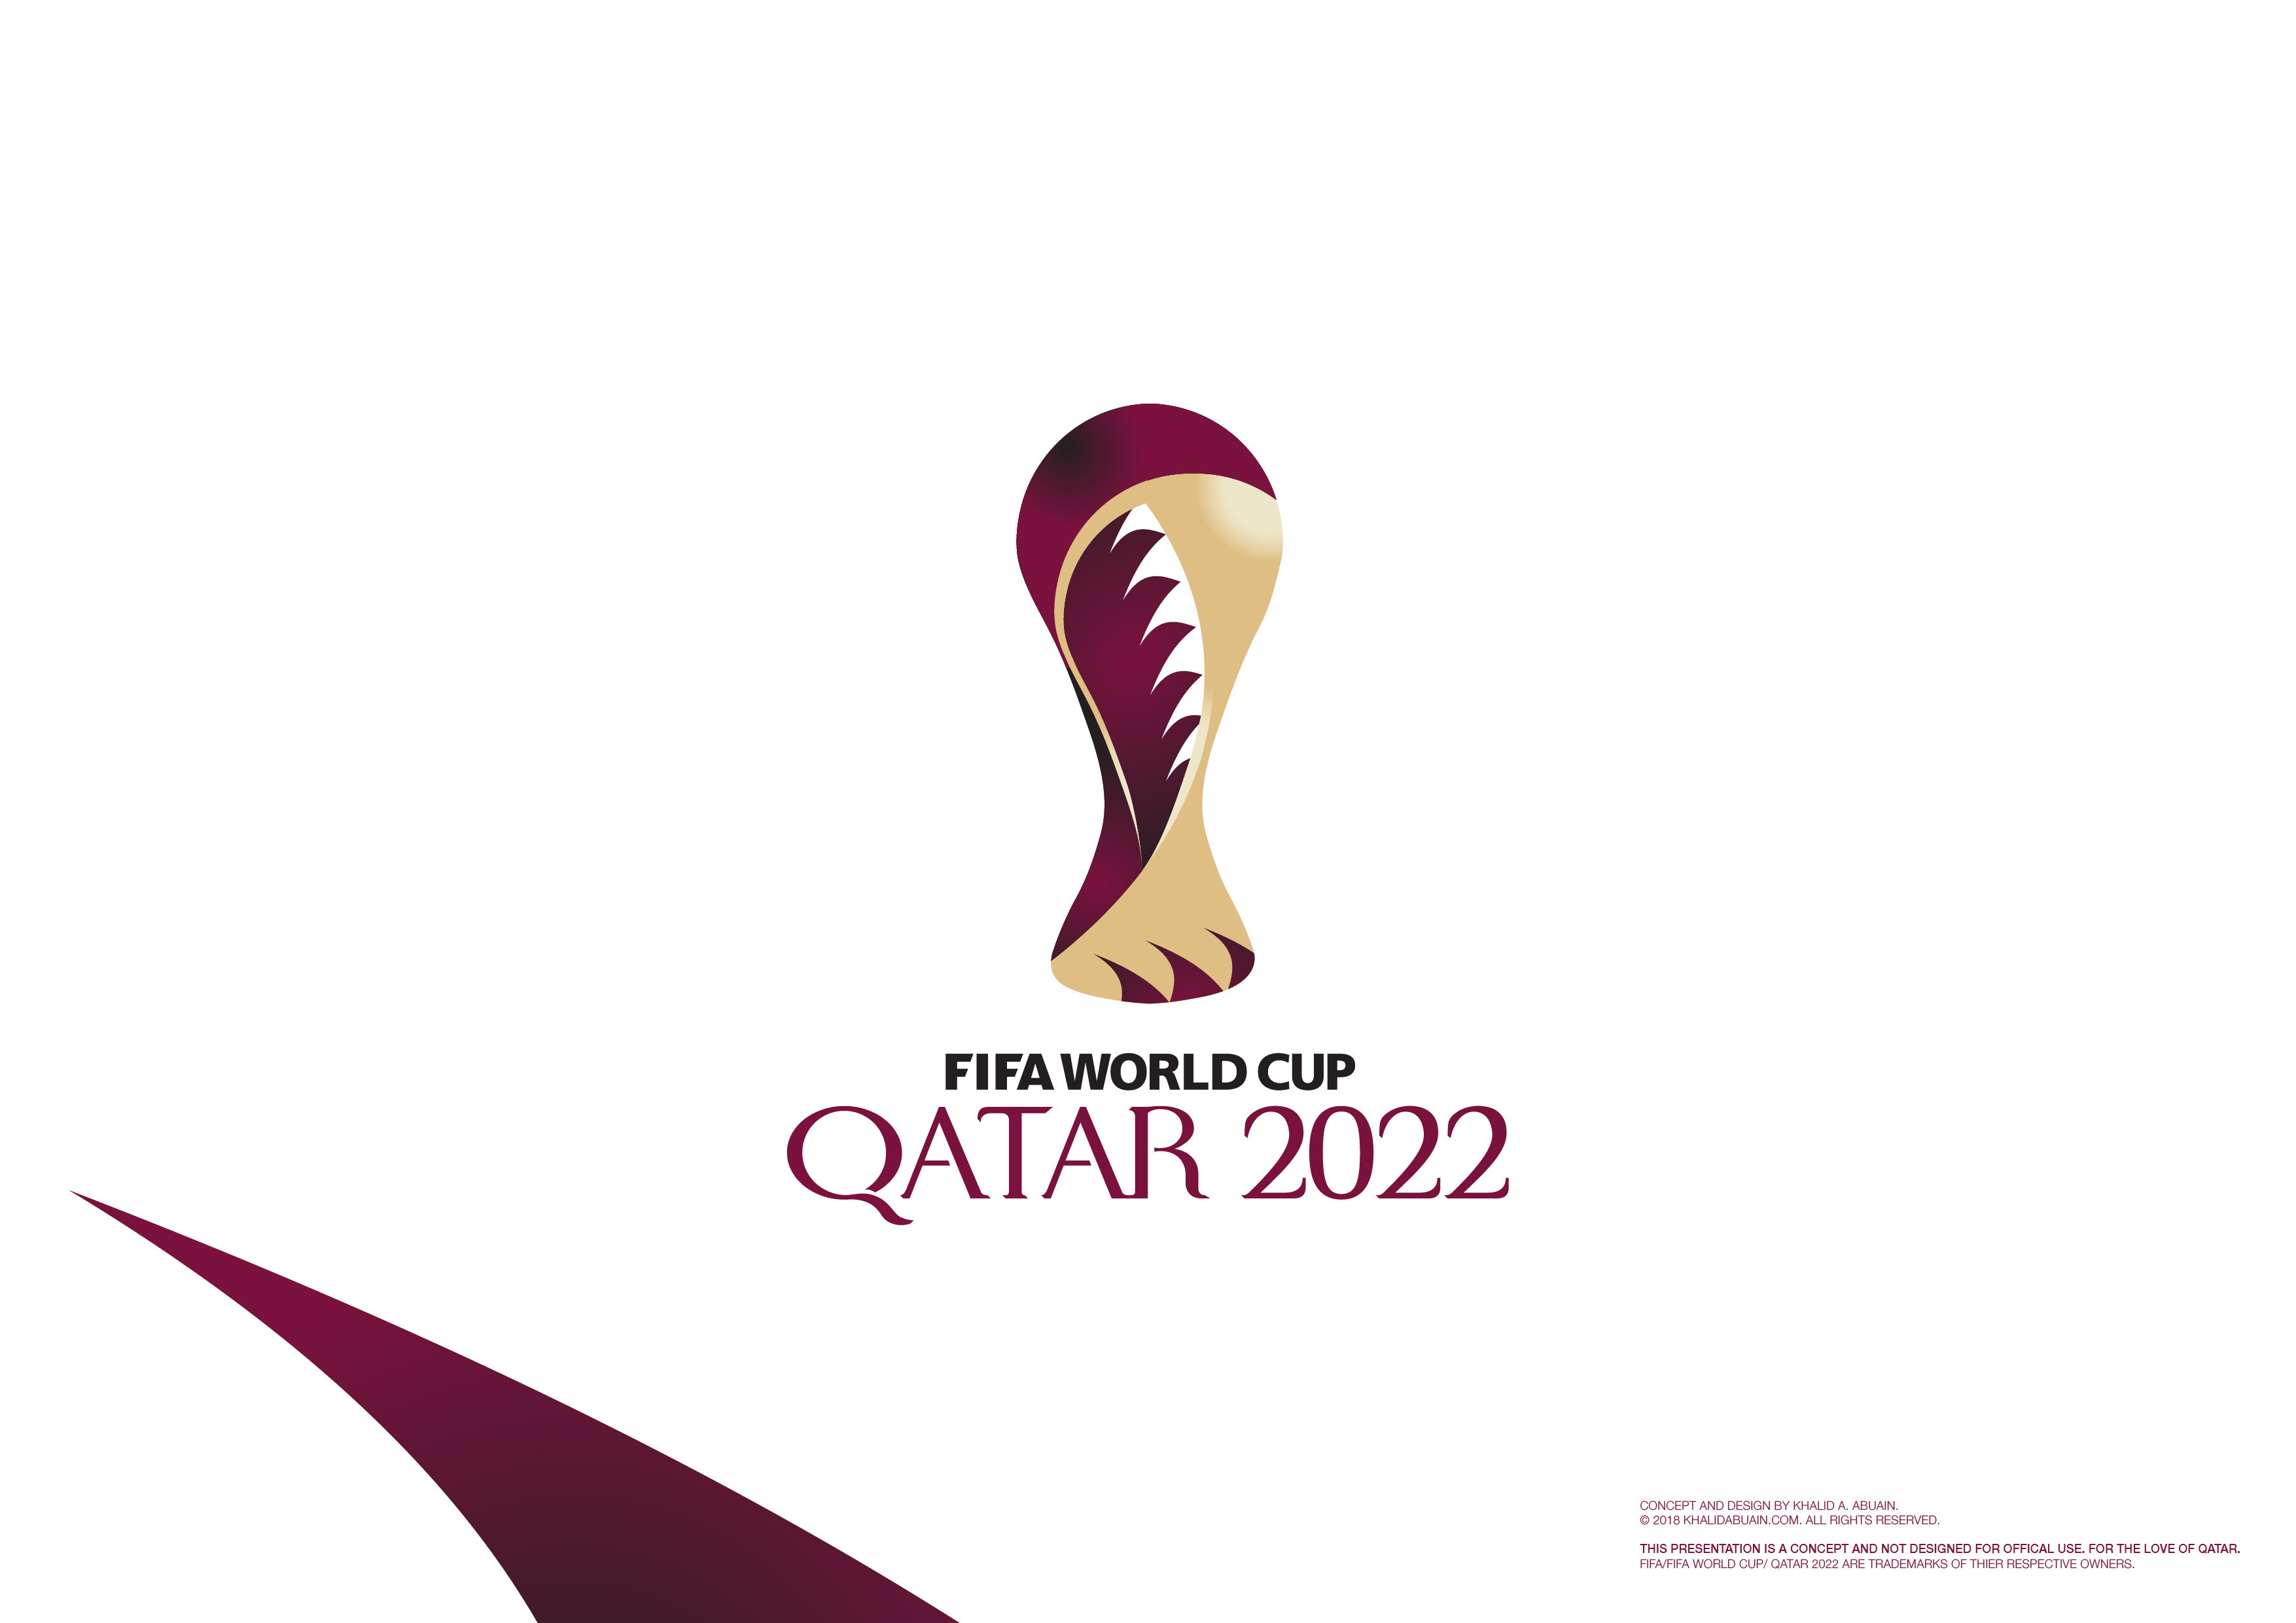 qatar 2022 branding concept unofficial on behance